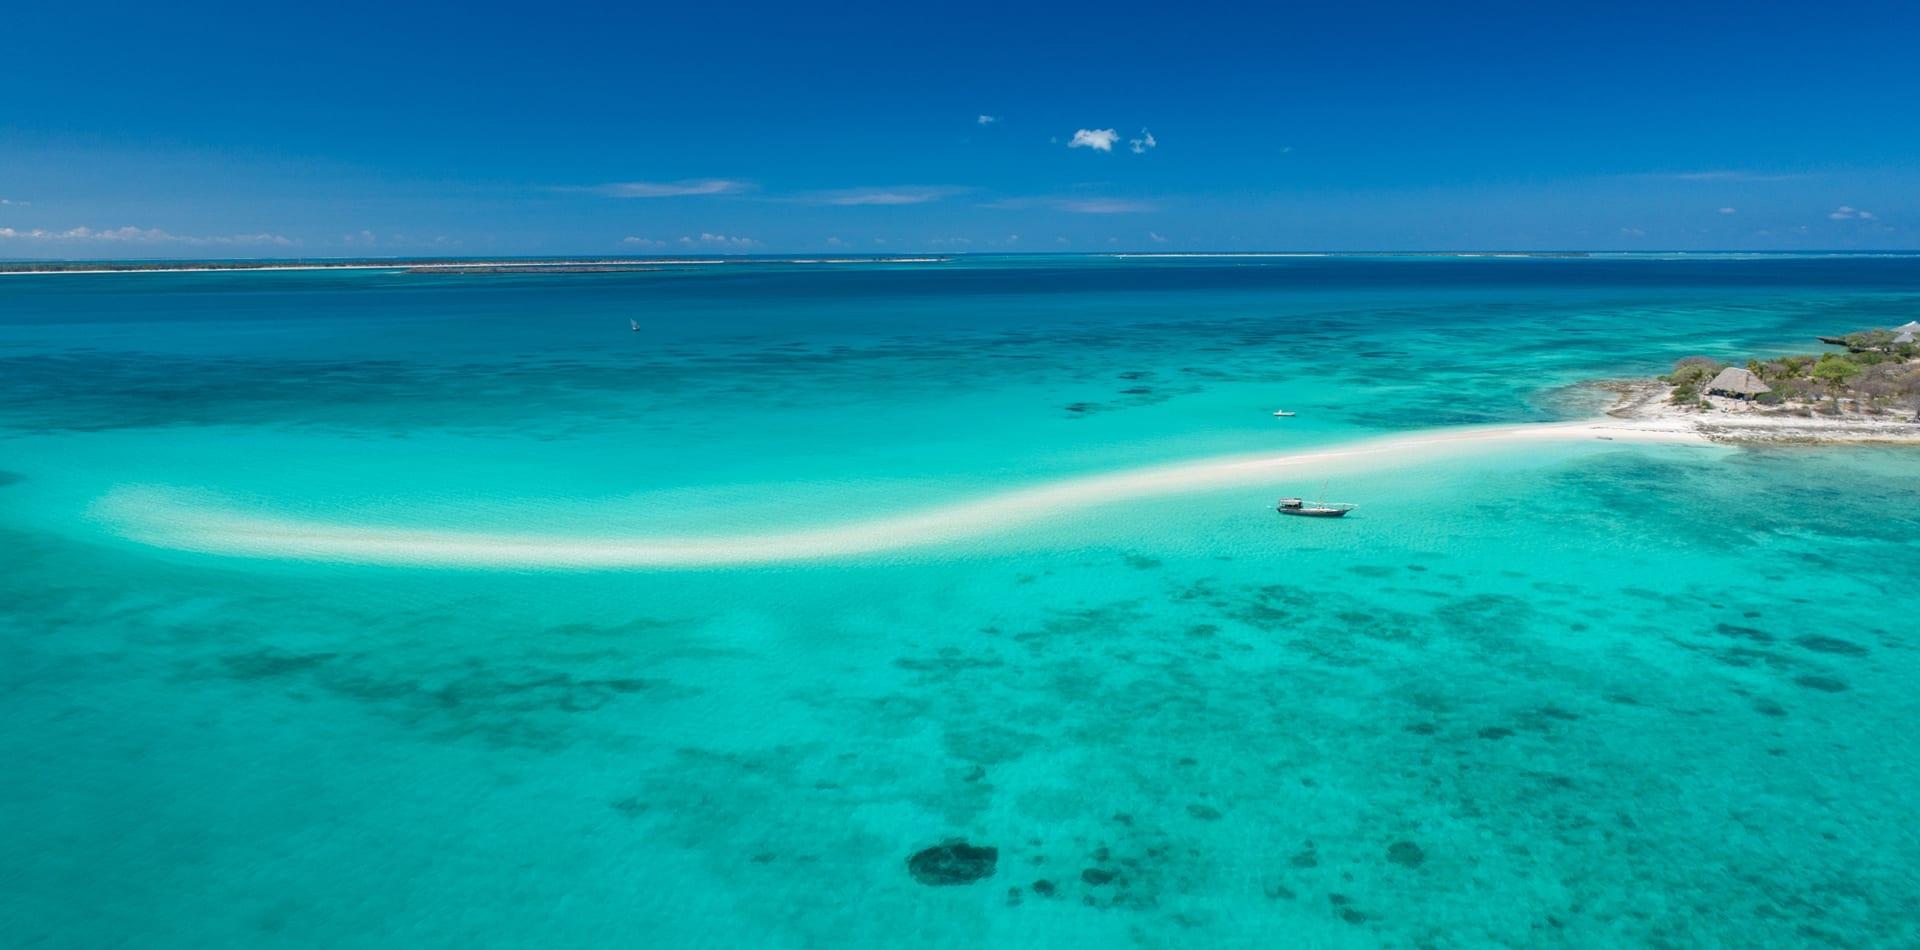 HERO Mozambique Islands and Ocean